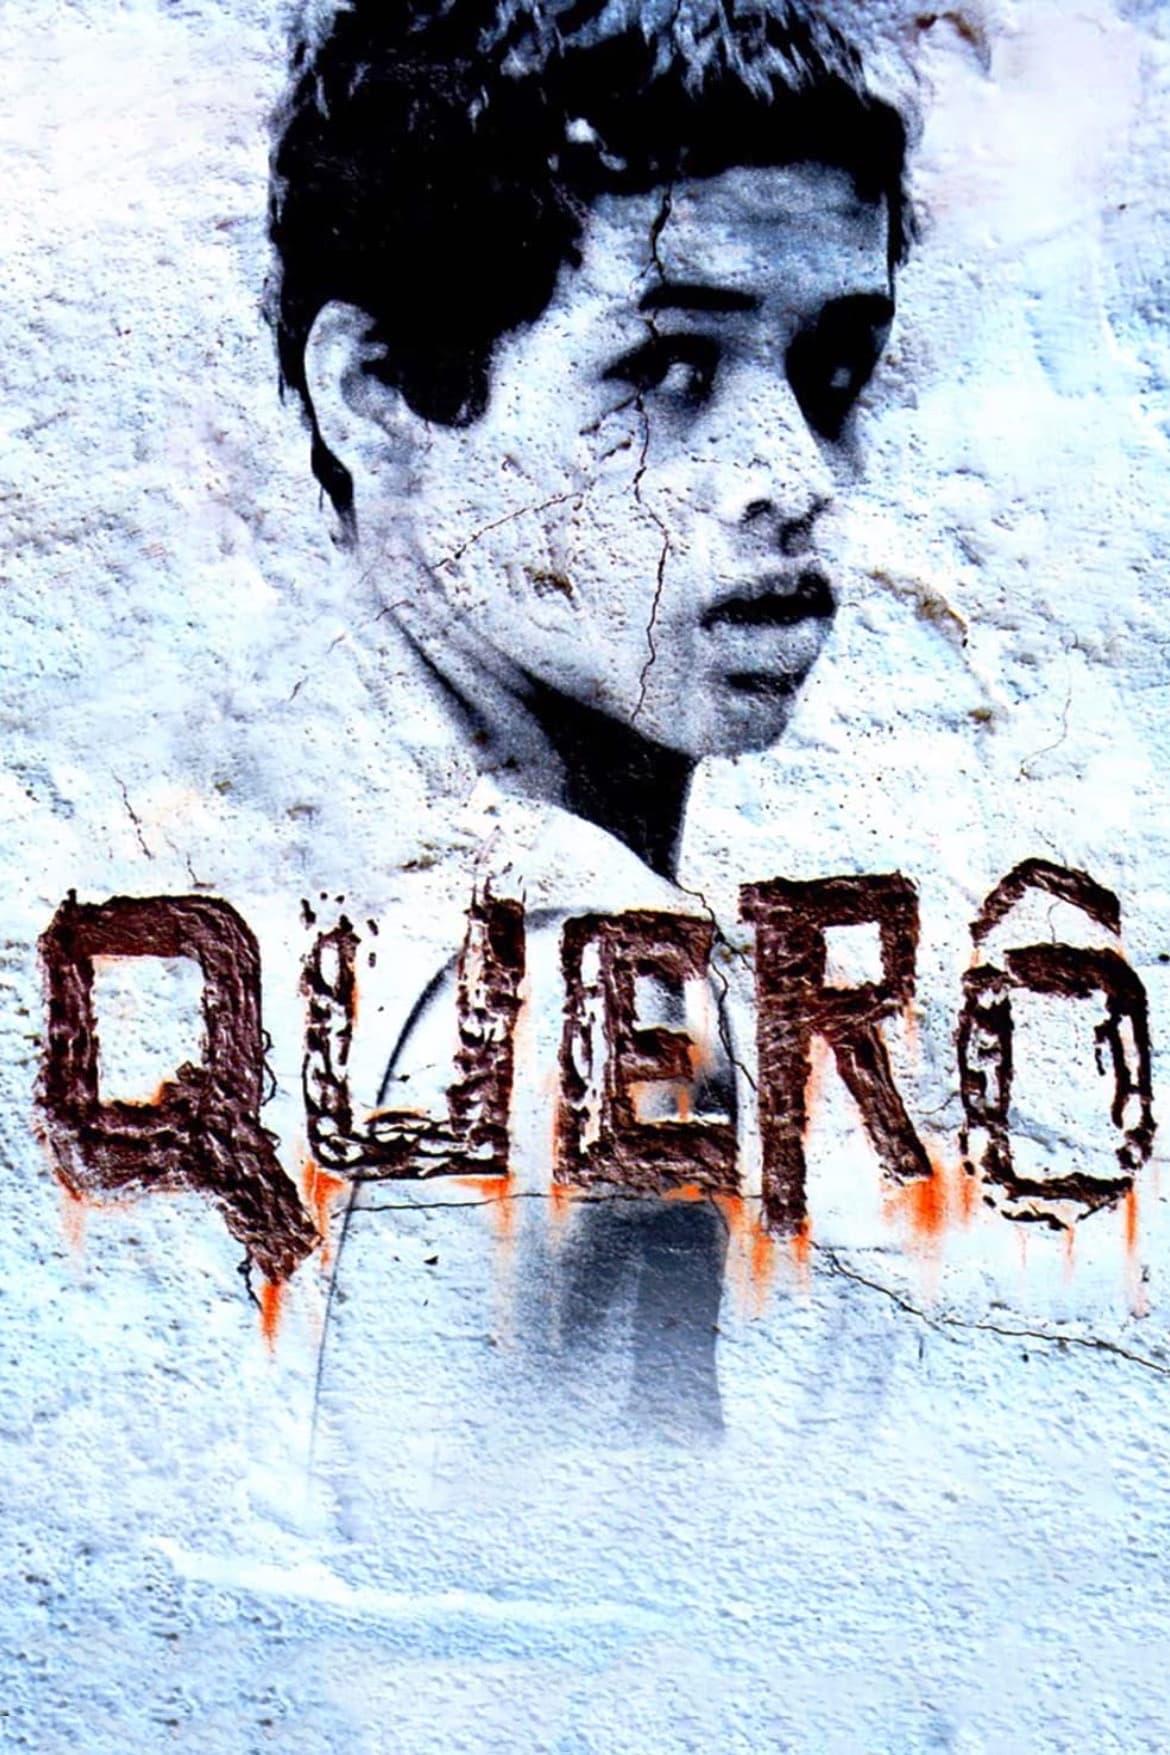 Querô: A Damned Report